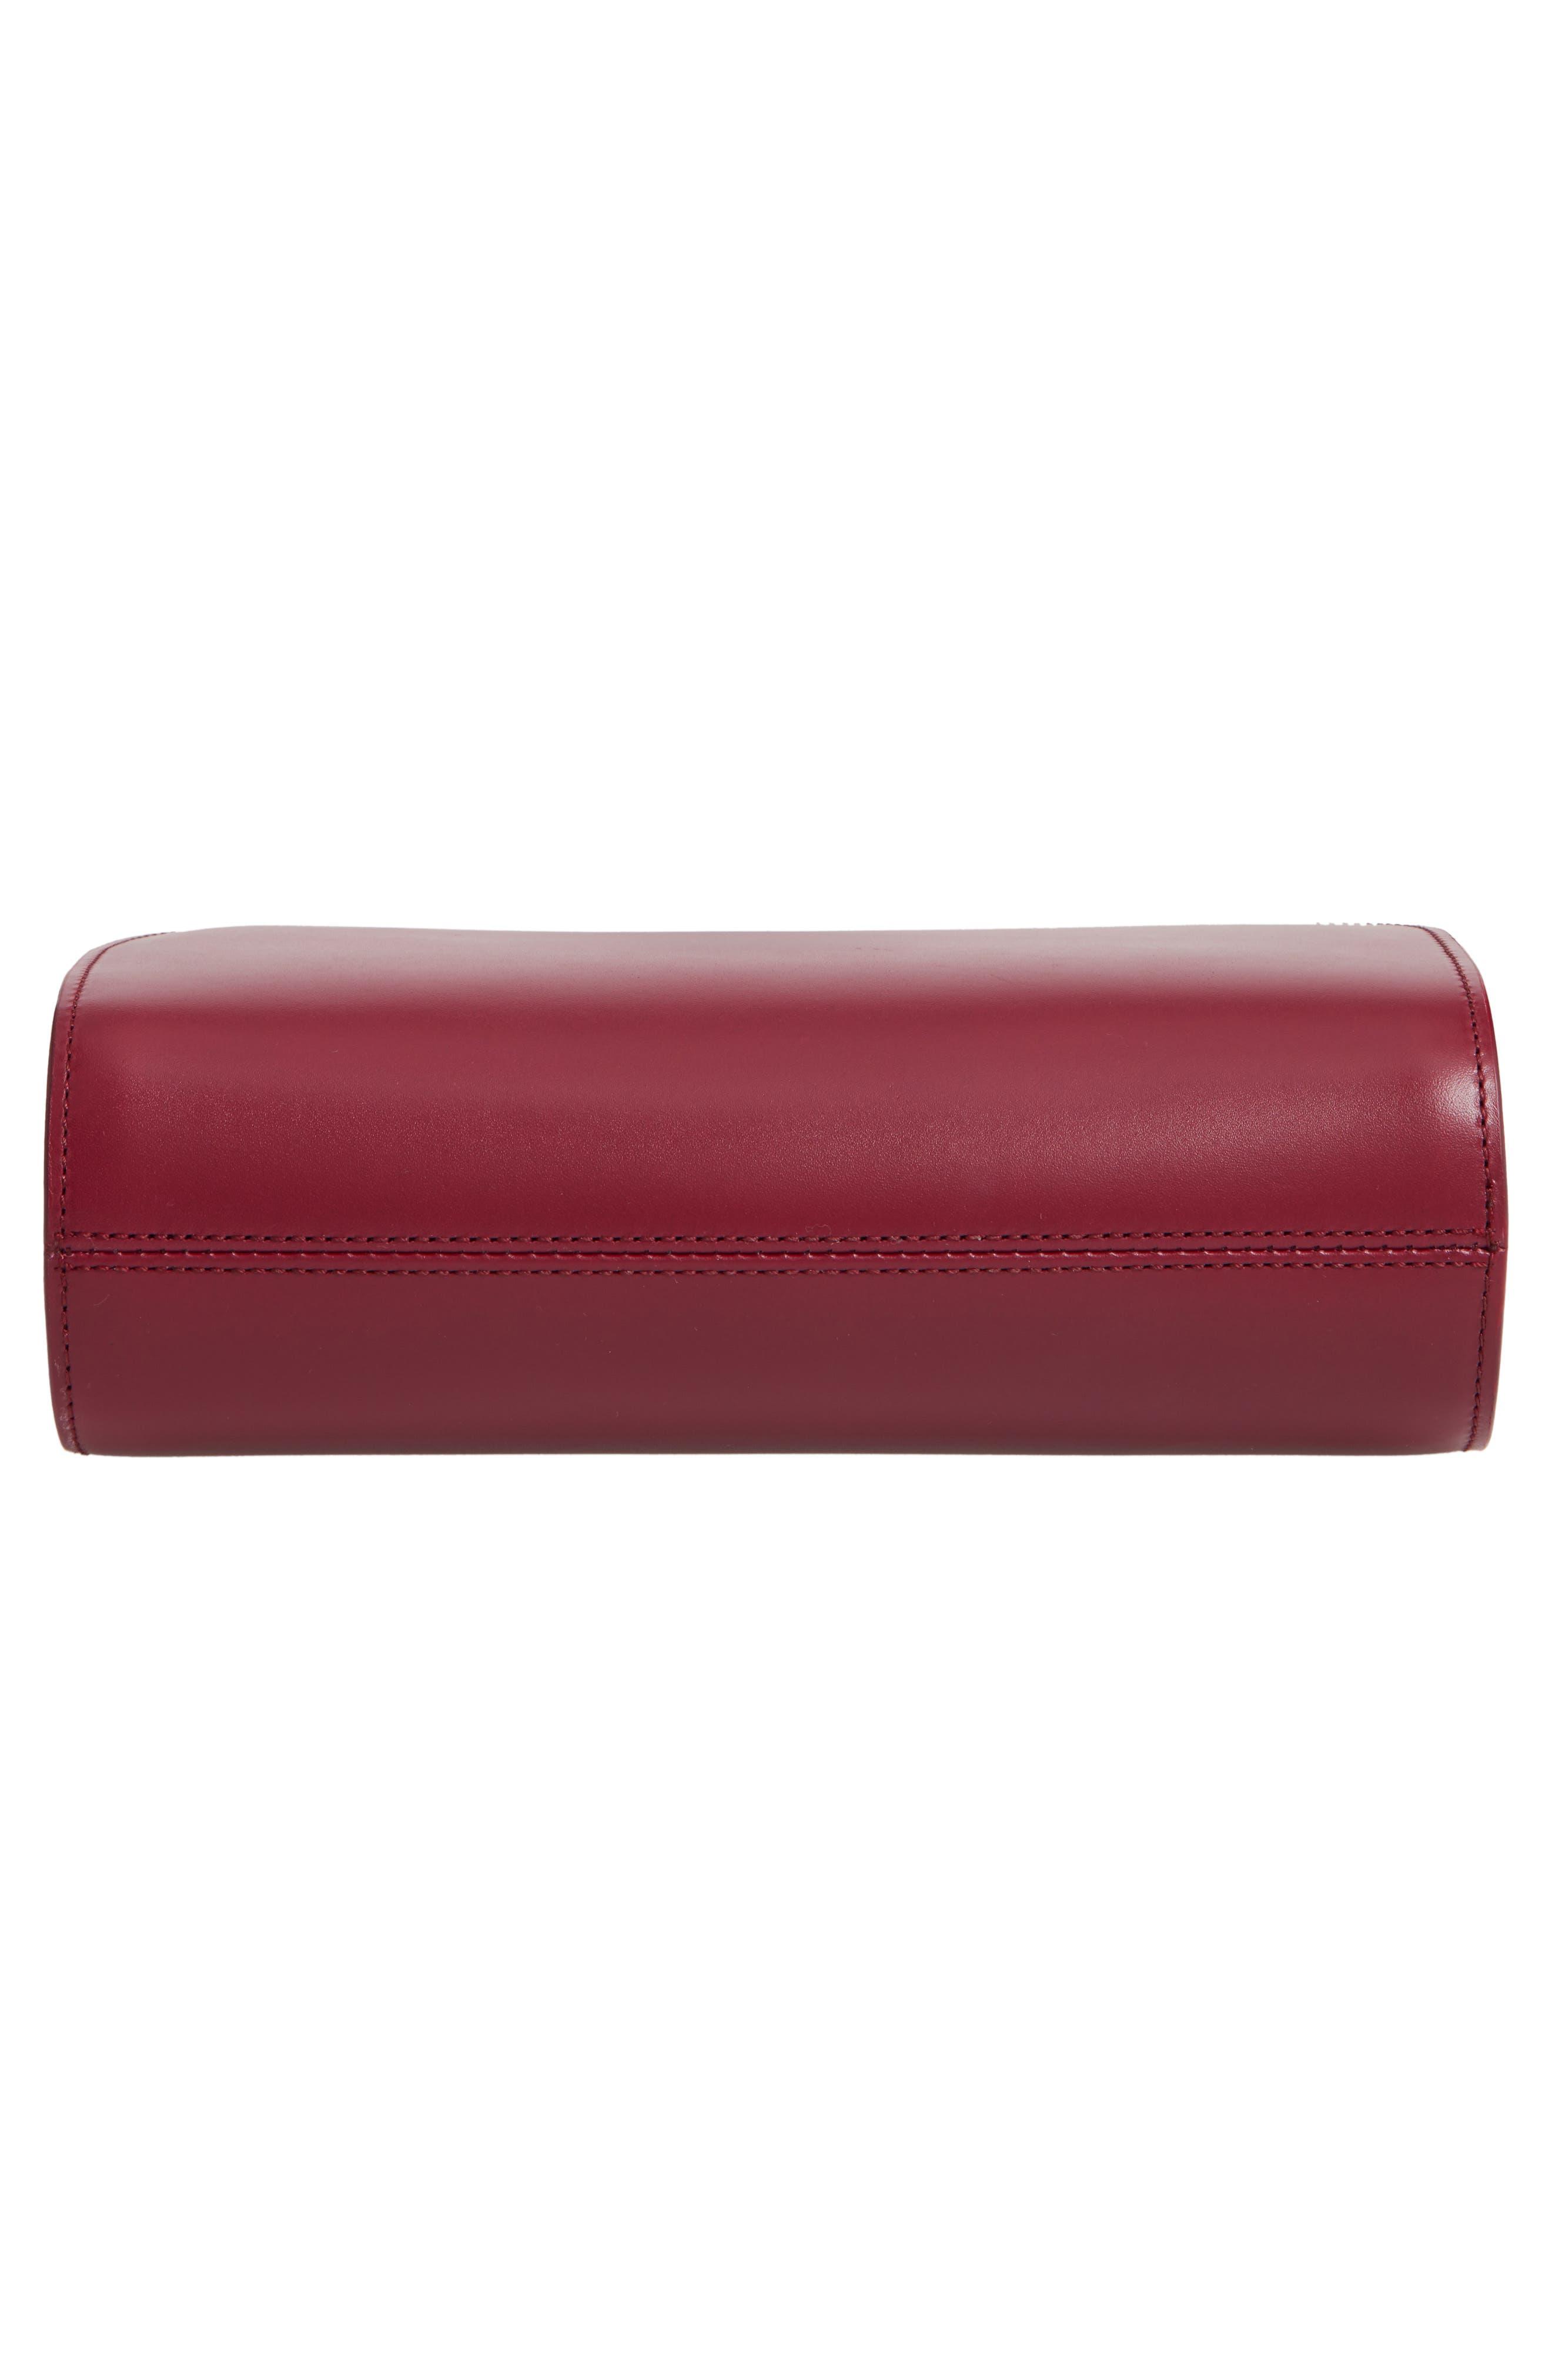 Sac Demi Lune Leather Crossbody Bag,                             Alternate thumbnail 6, color,                             FRAMBOISE